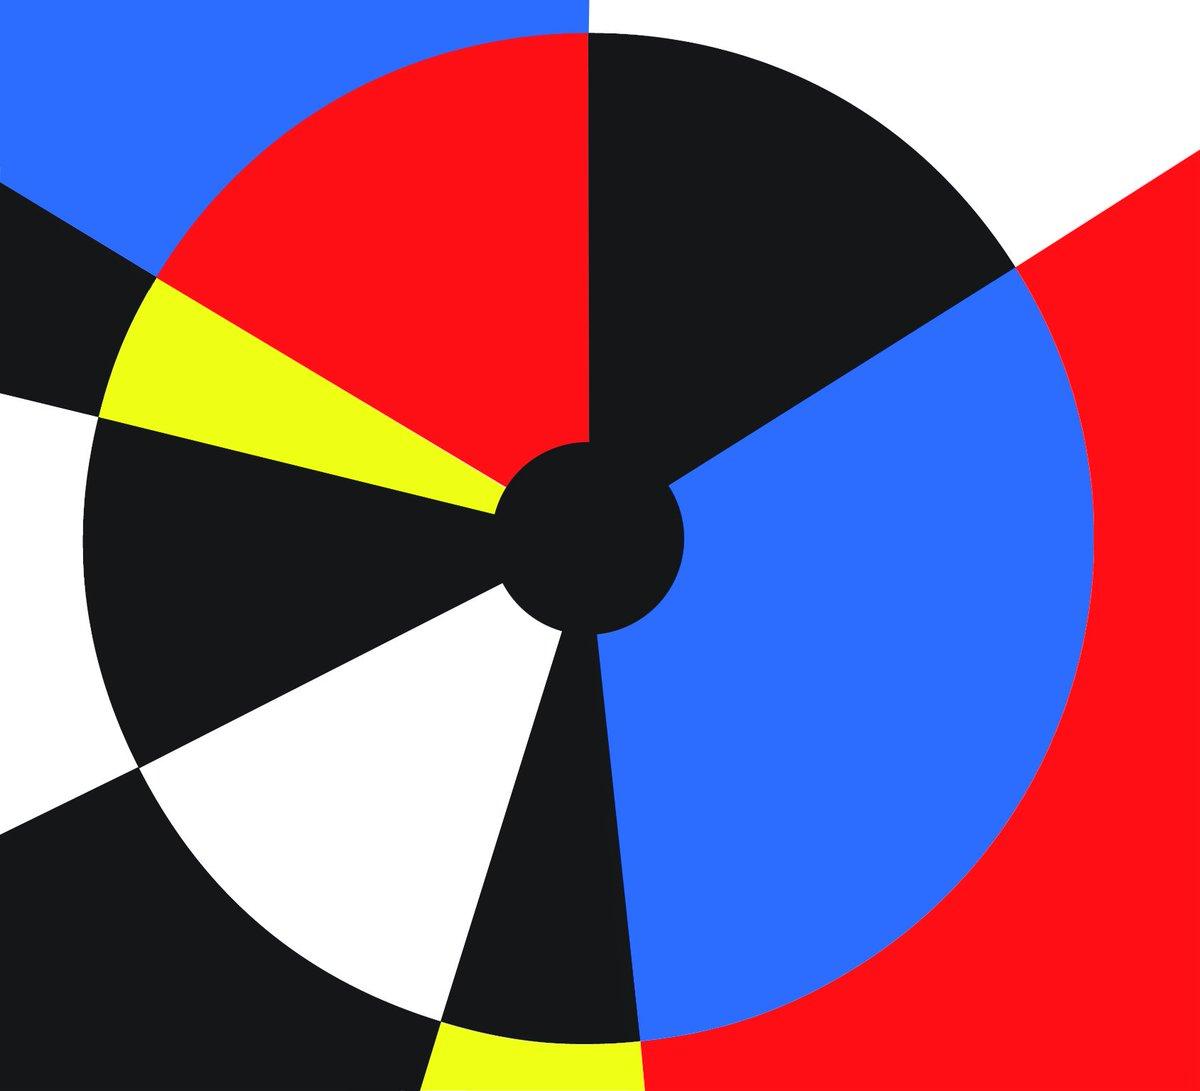 Fantastic @ElectricityClub review of forthcoming Blancmange album Commuter 23    https://t.co/ReJ5HAkpBv https://t.co/OIq7yDGISv